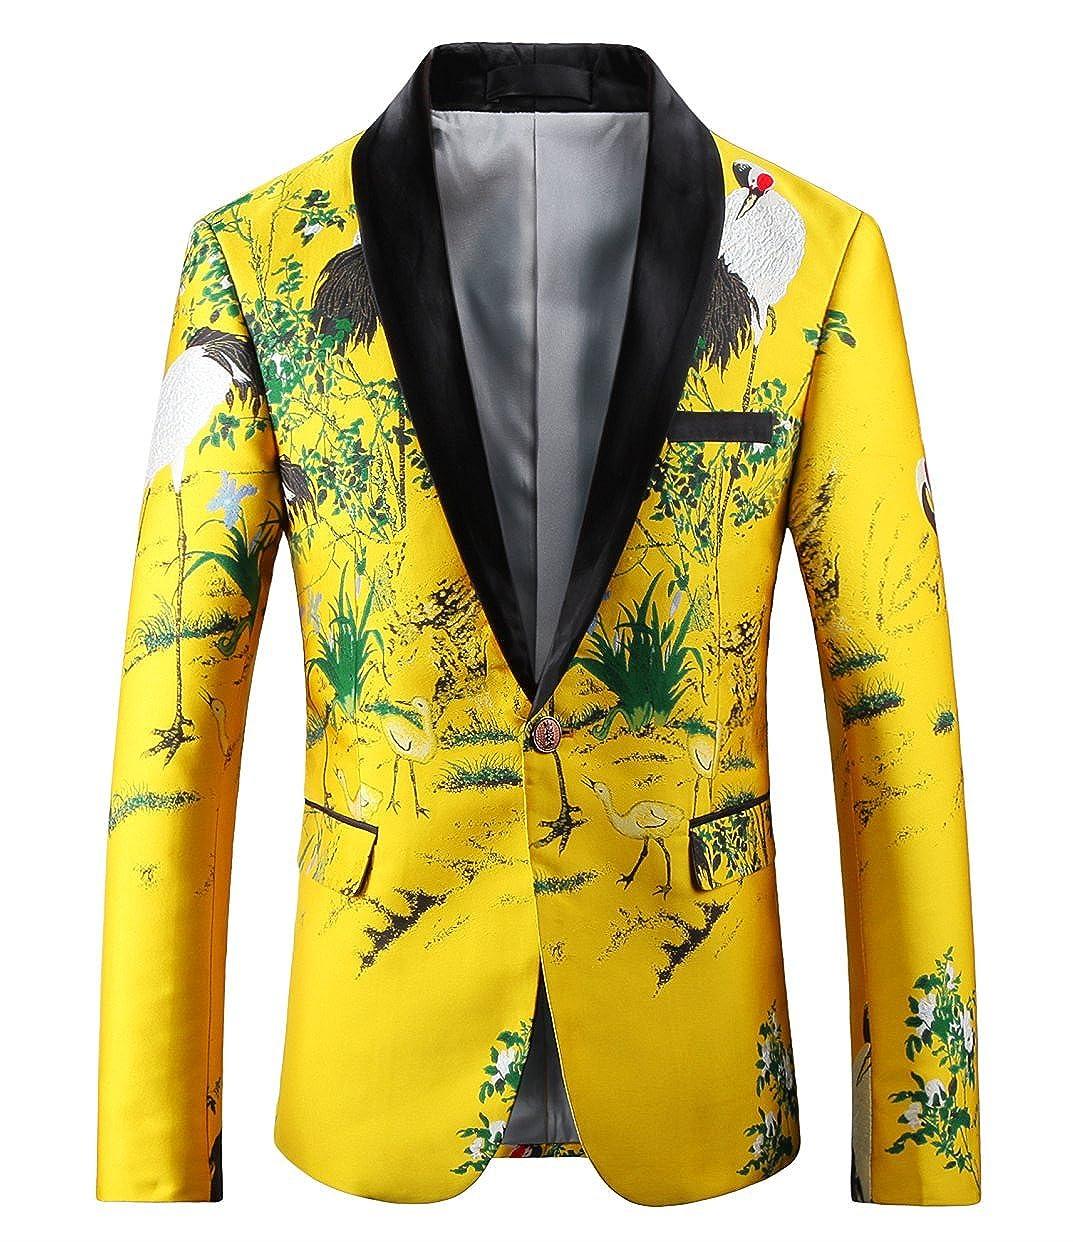 f77e7706b21c4 MOGU Mens Slim Fit Yellow Blazer Printed Sport Coat at Amazon Men s  Clothing store